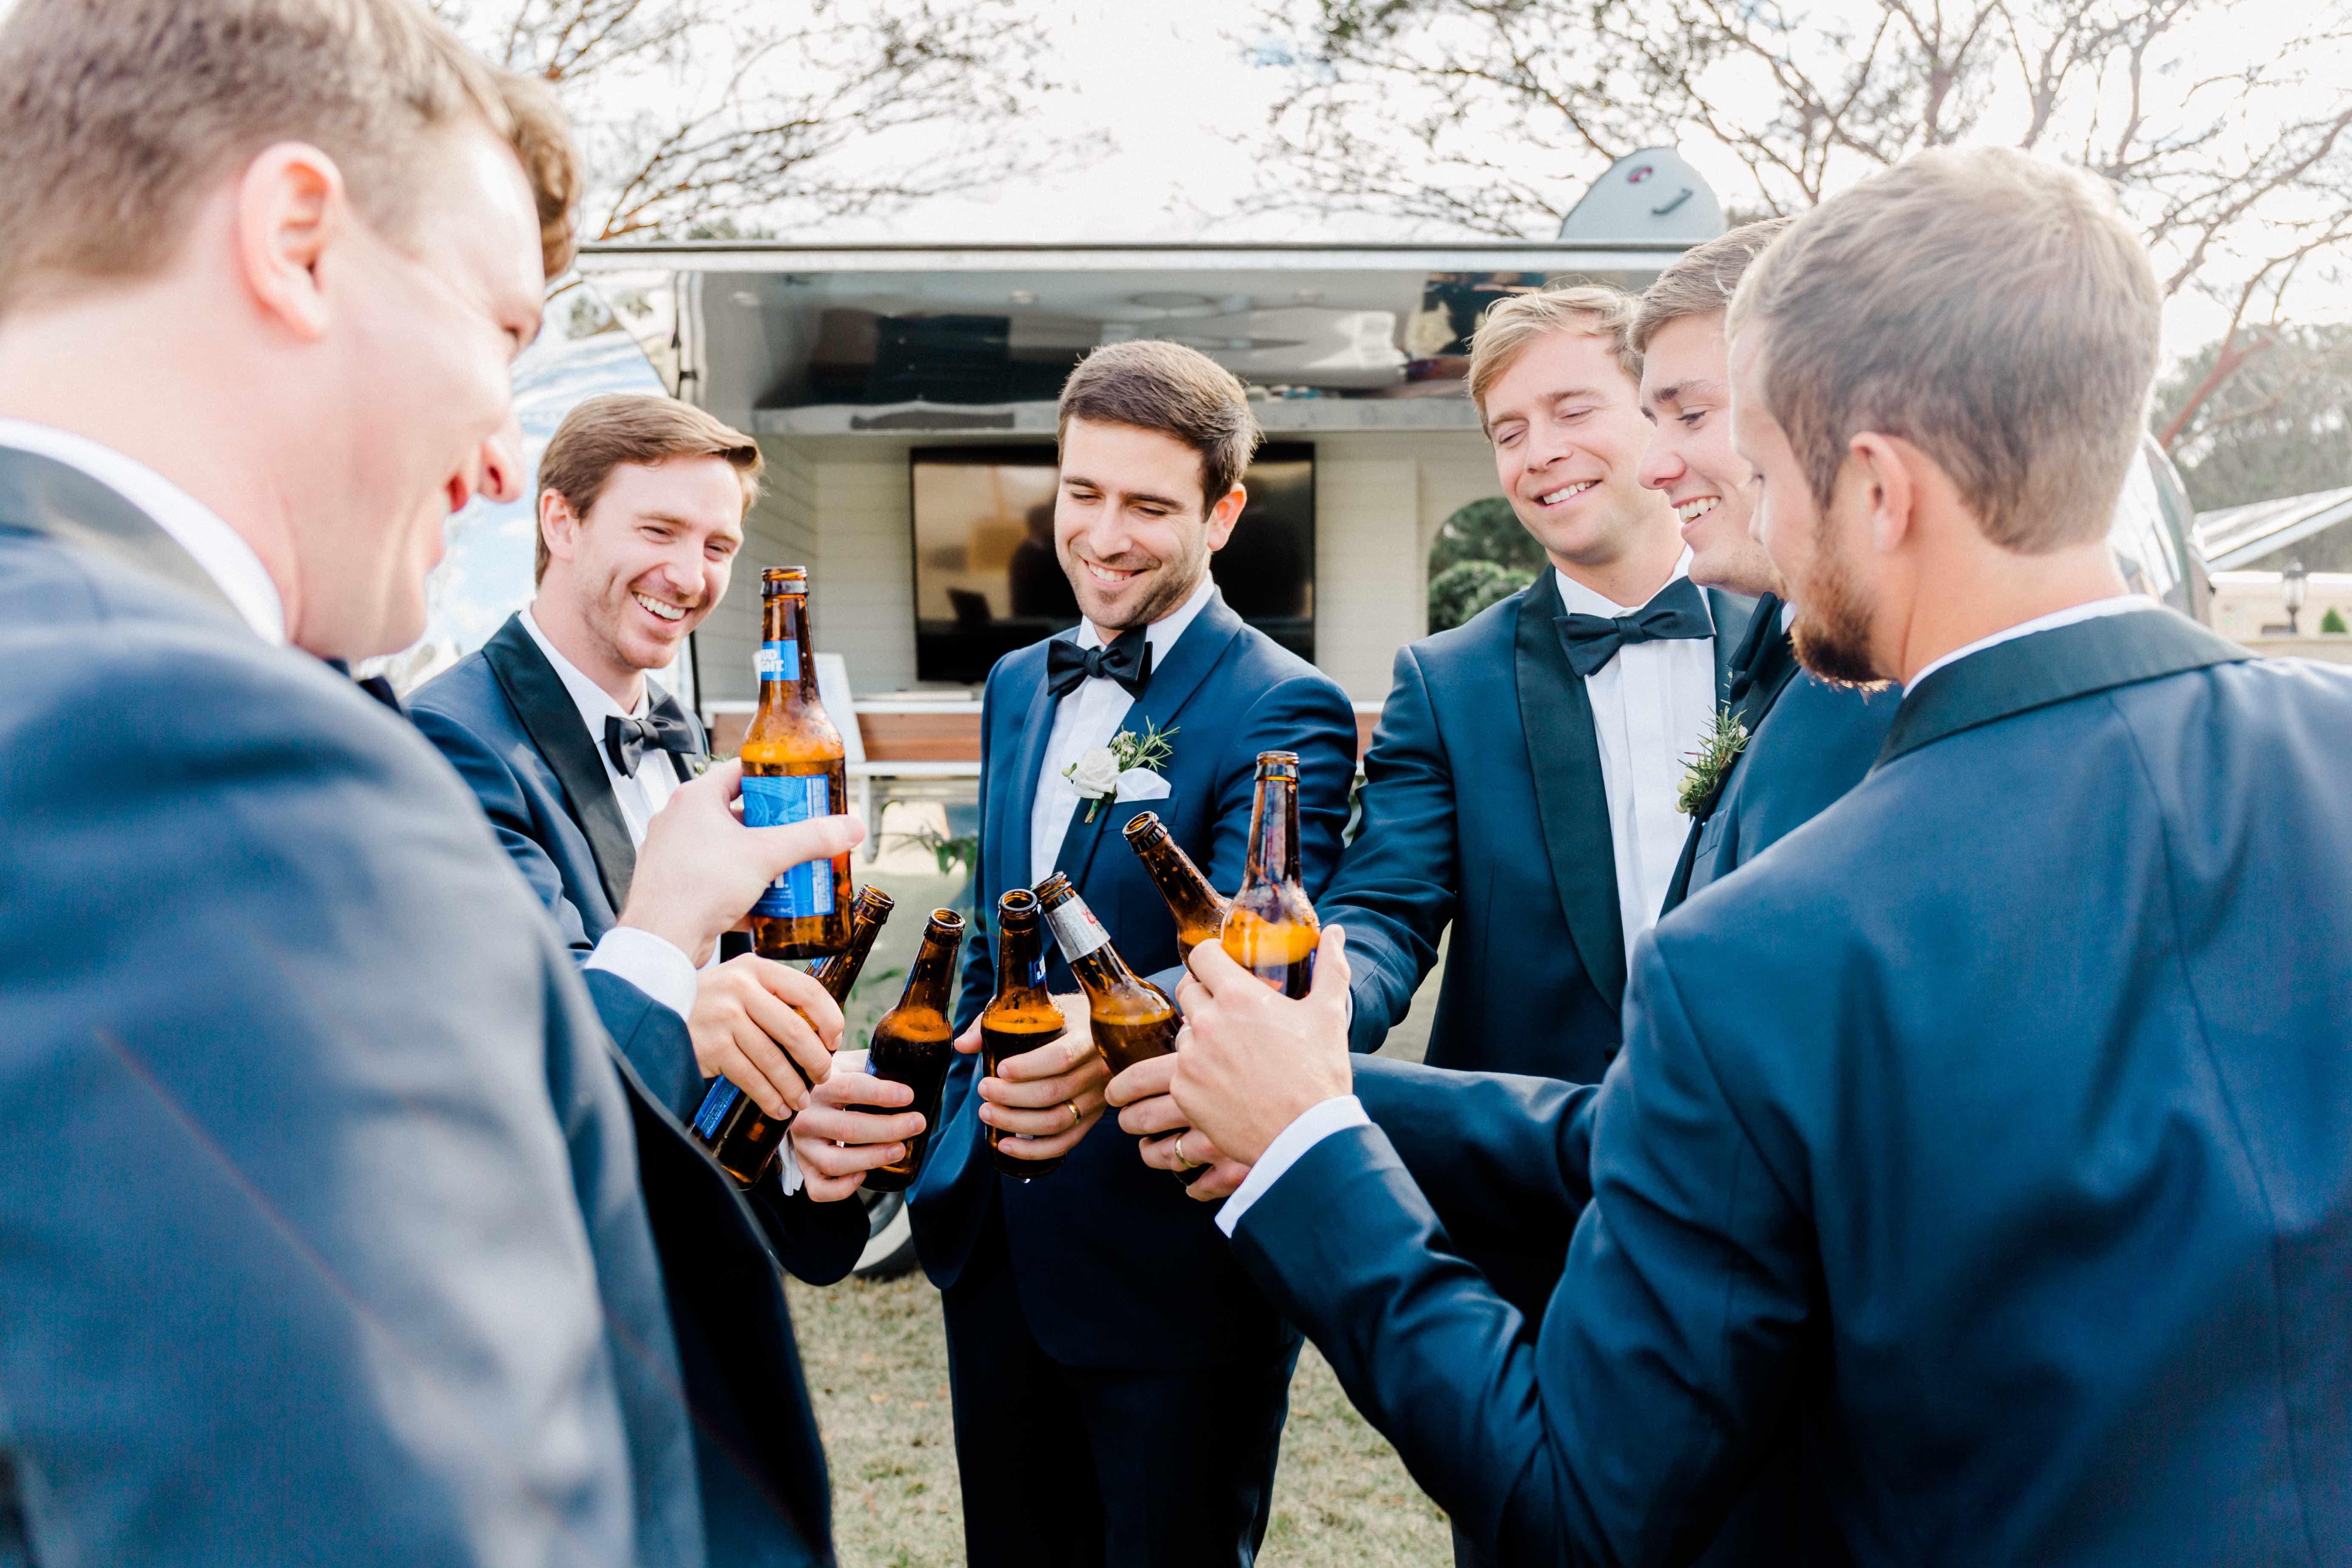 airstream-mobile-bar-wedding-reception